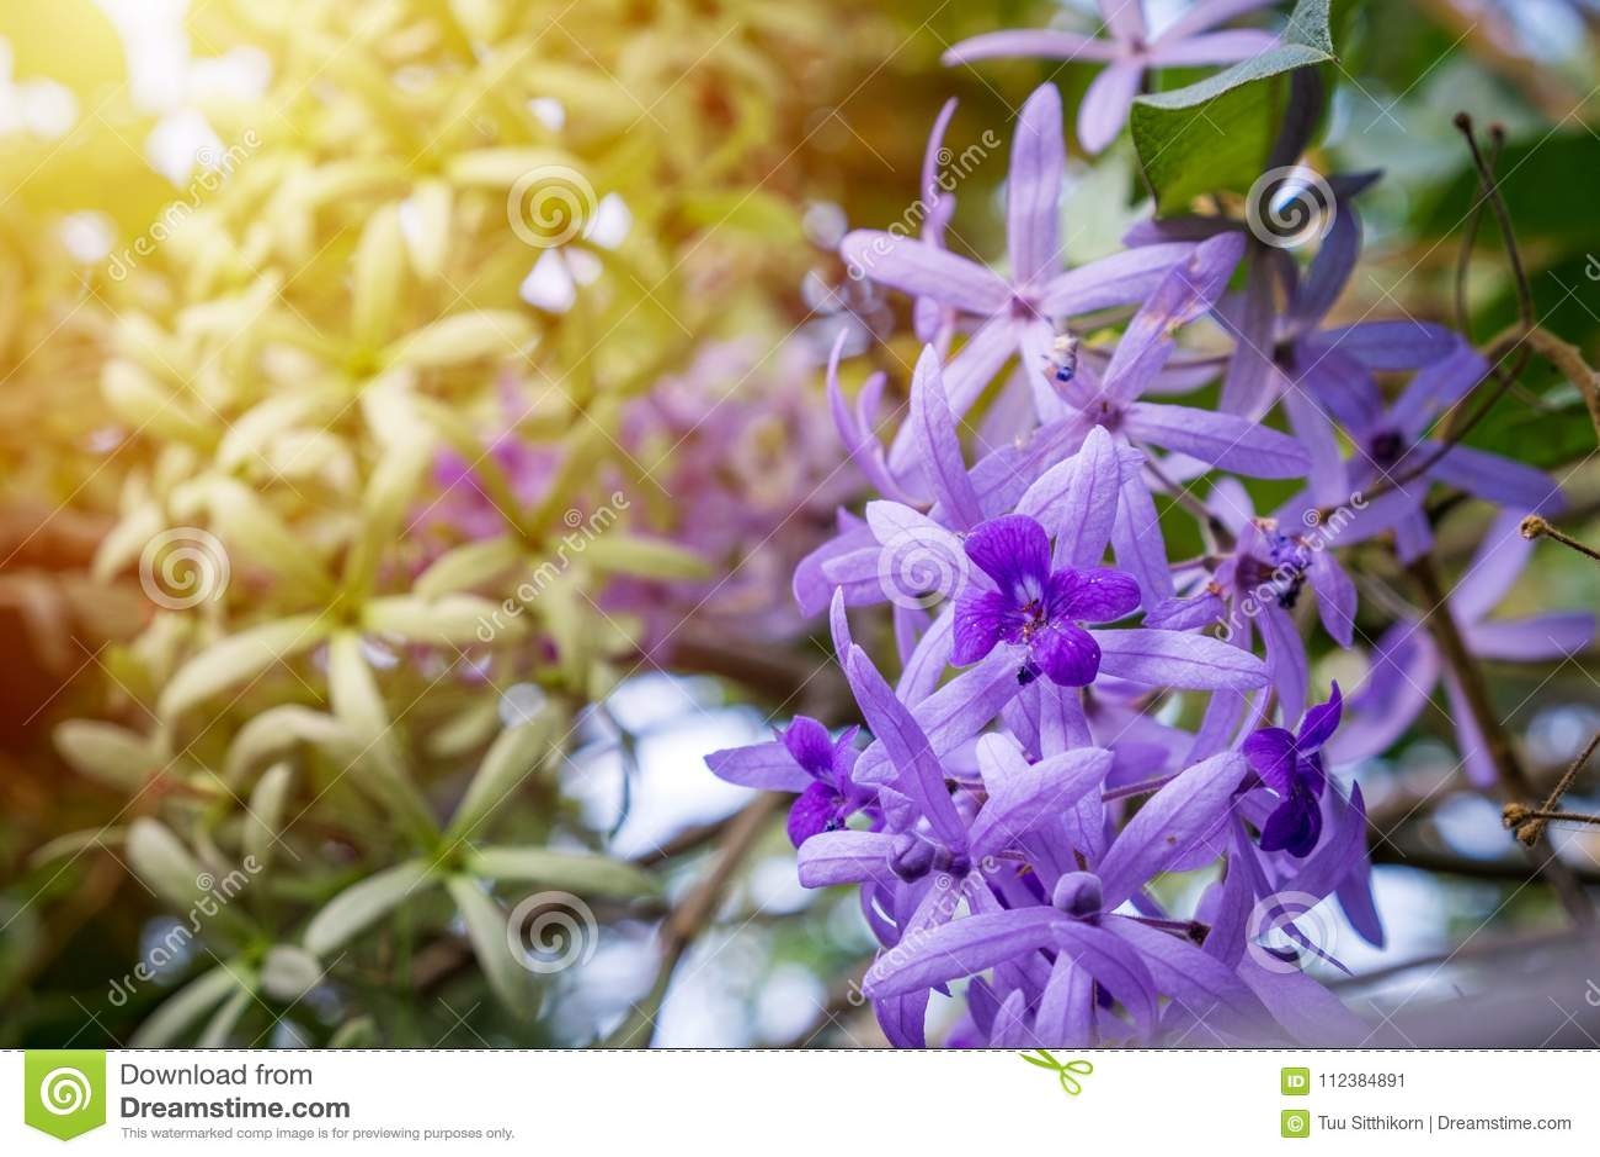 Beautiful Purple Flowers In The Gardensandpaper Vine Stock Image